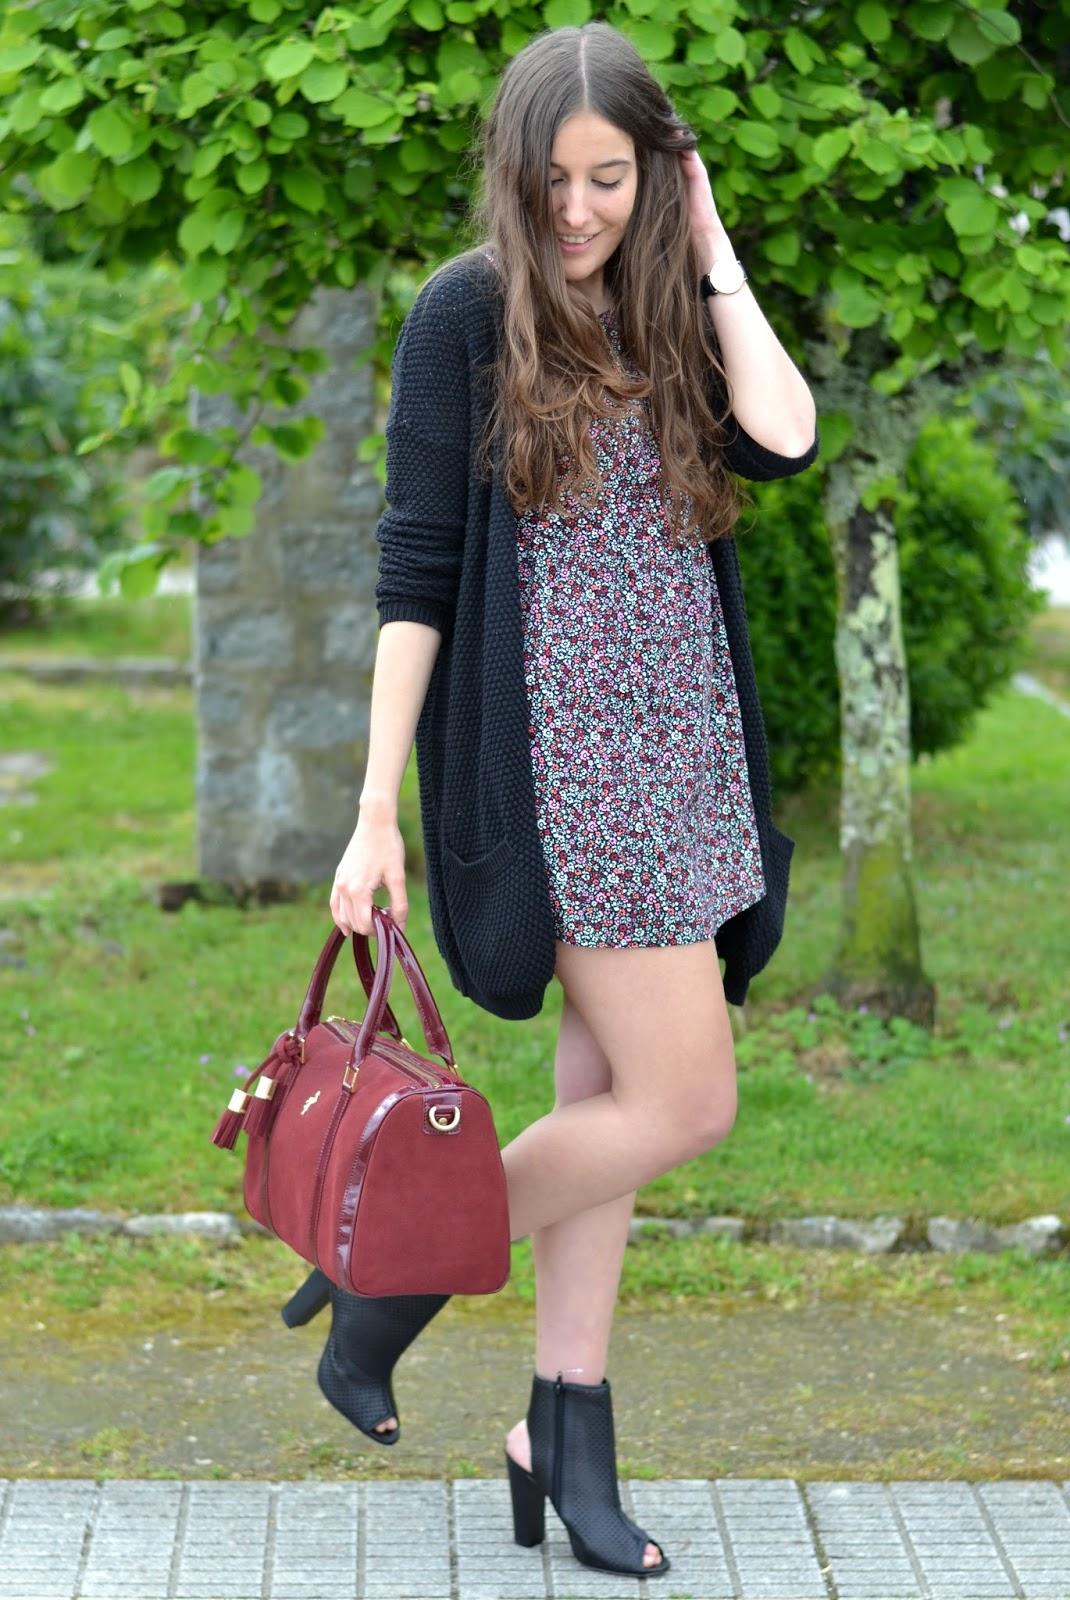 bolso burgundy menbur, vestido flores, cardigan, botines marypaz